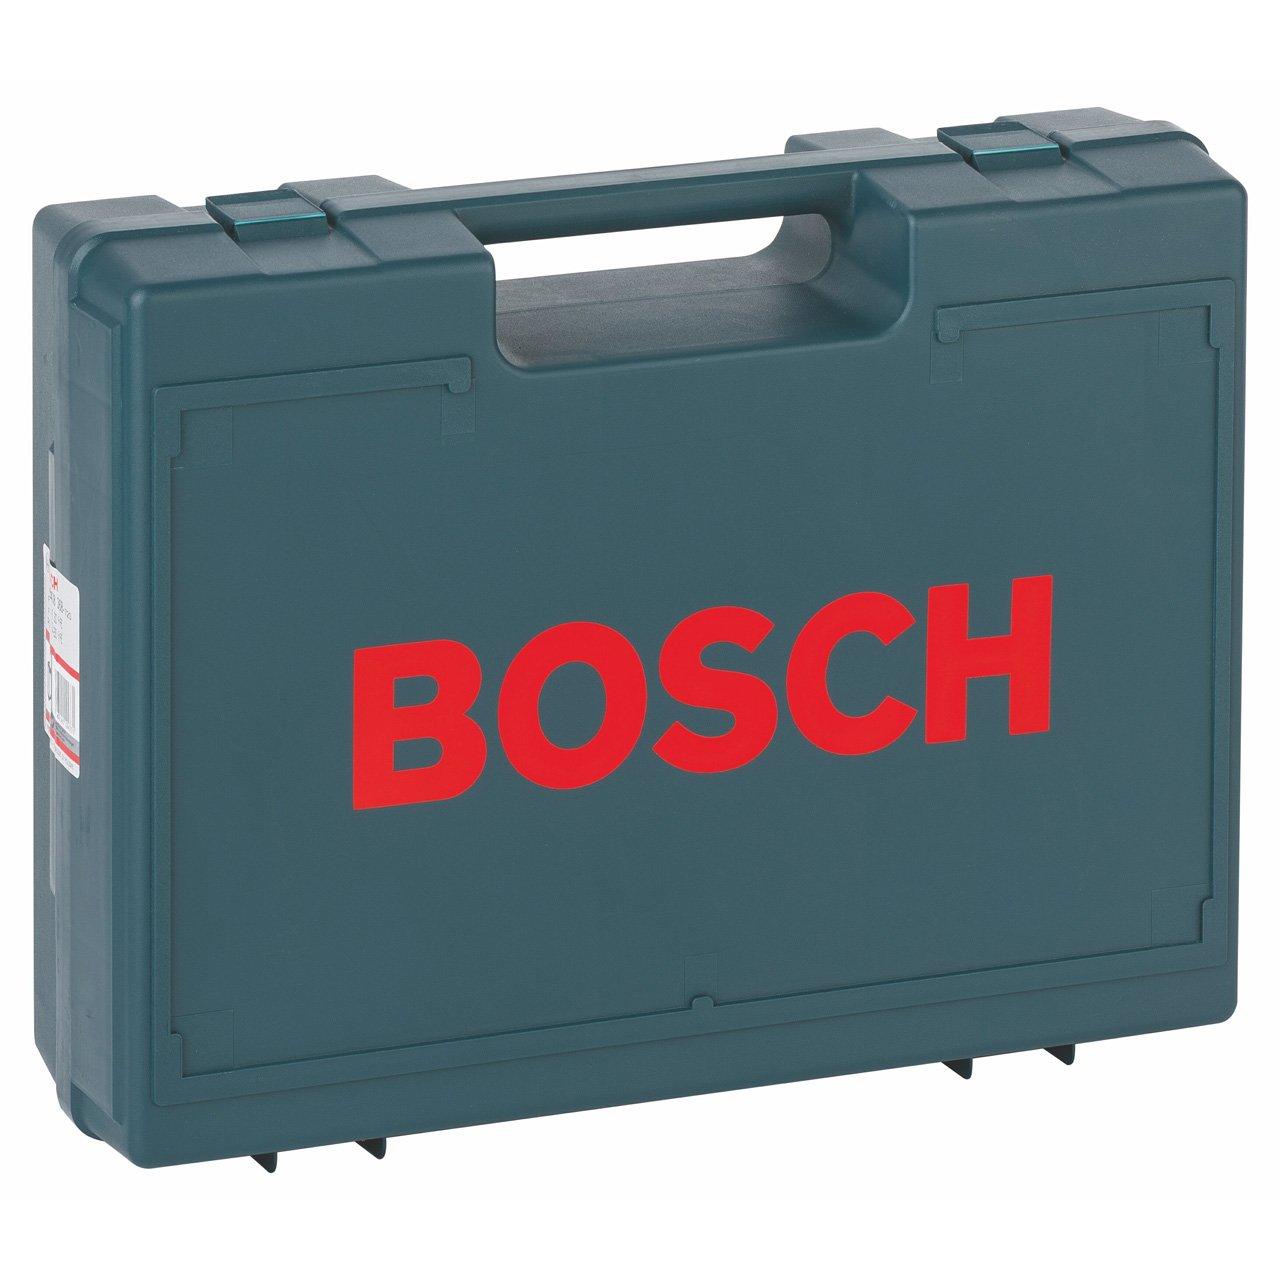 Bosch 2 605 438 368 color azul Malet/ín de transporte de 420 x 330 x 130 mm